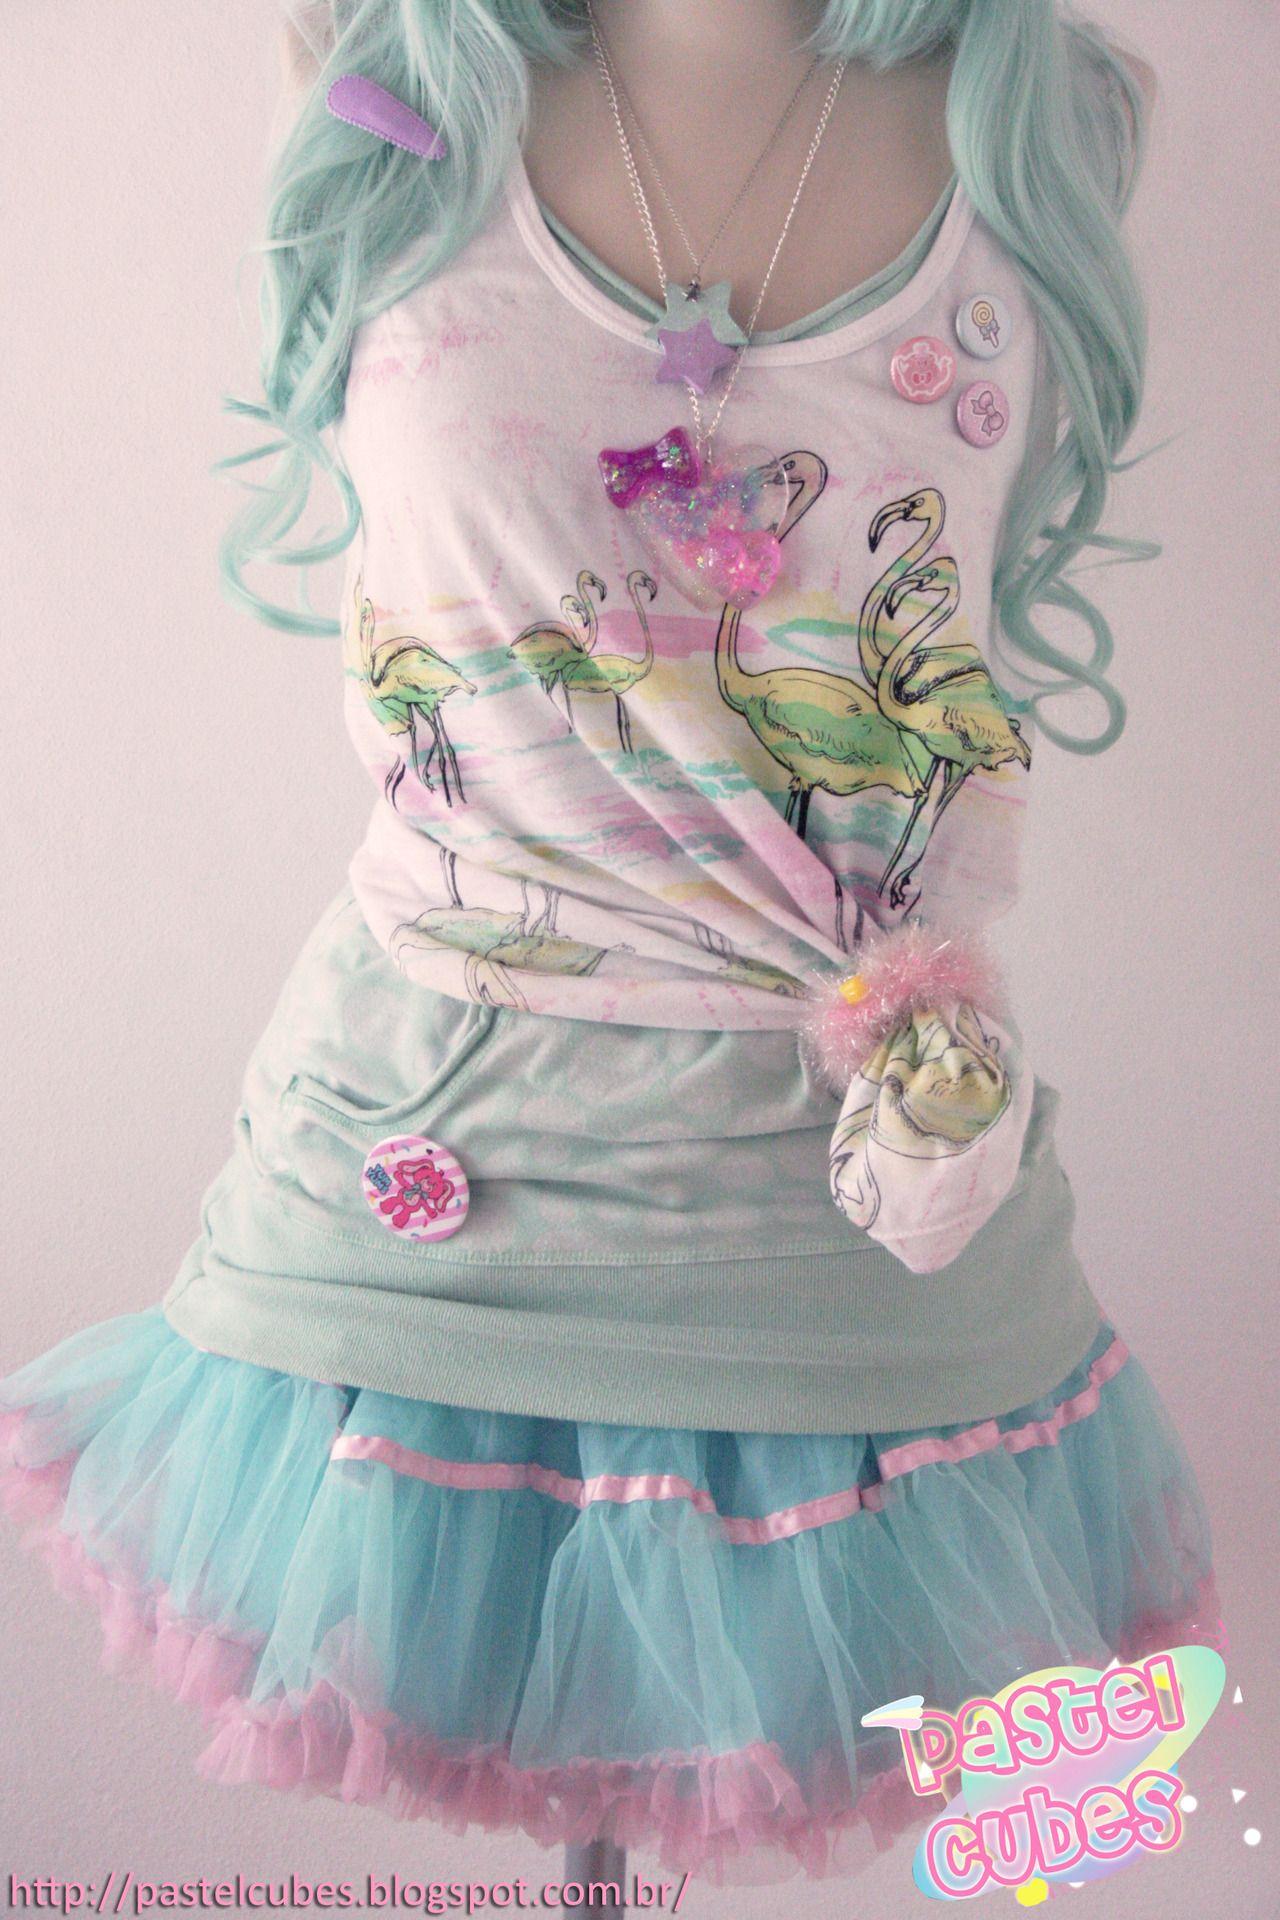 Fairy Kei/Pop Kei ♡ ♥ ロリータ, Deco Lolita, Loli, Fairy Kei, Pastel, Kawaii…